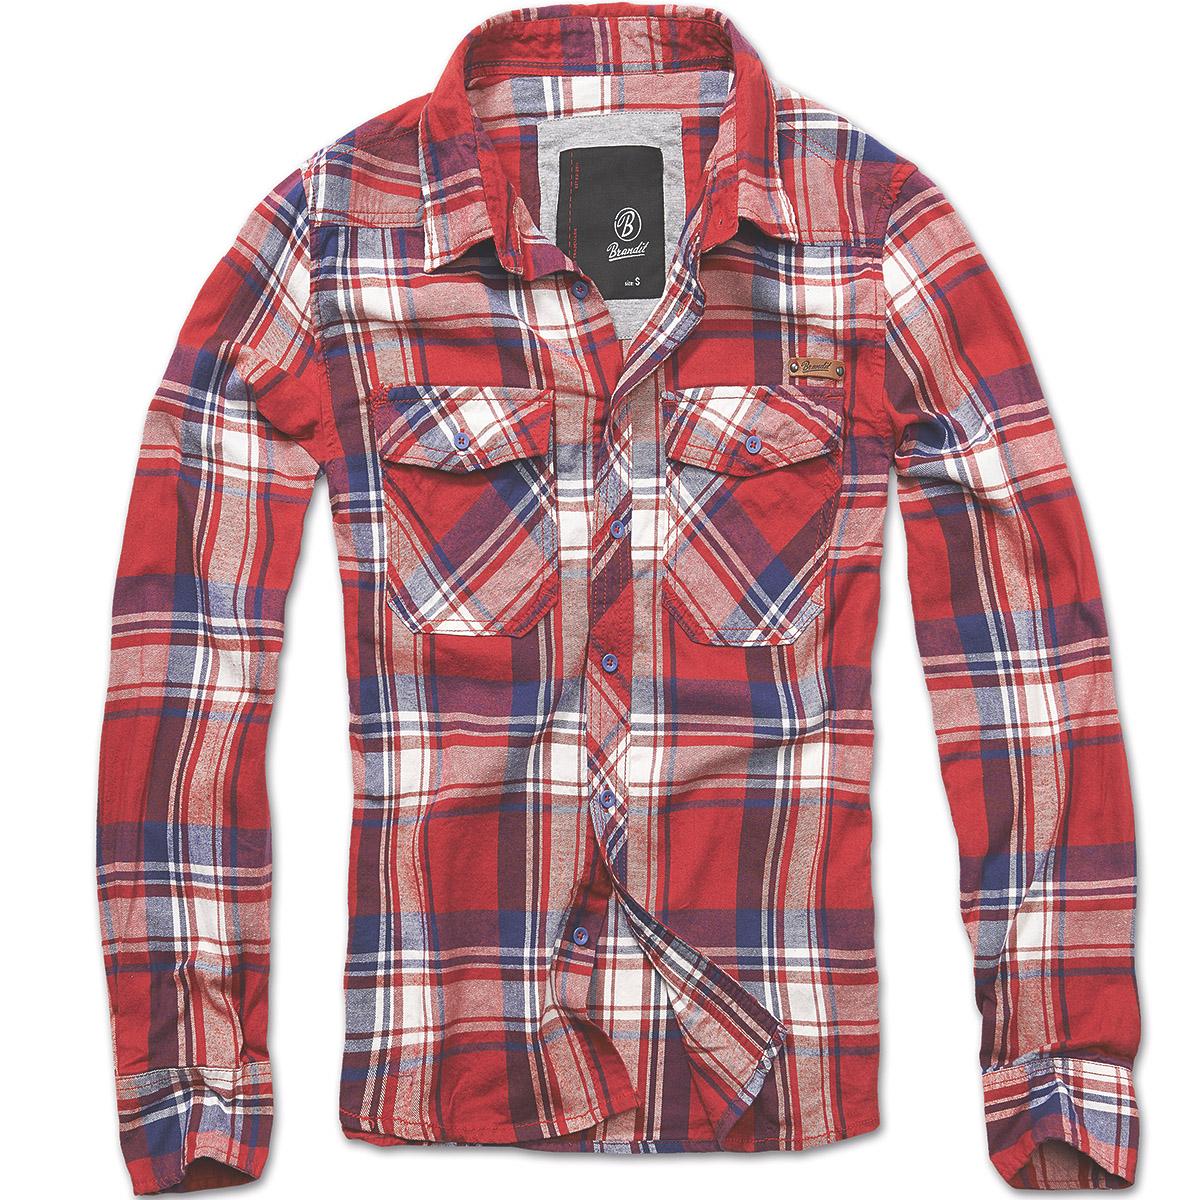 Brandit vintage style check cotton flannel shirt mens long for Best flannel shirt brands